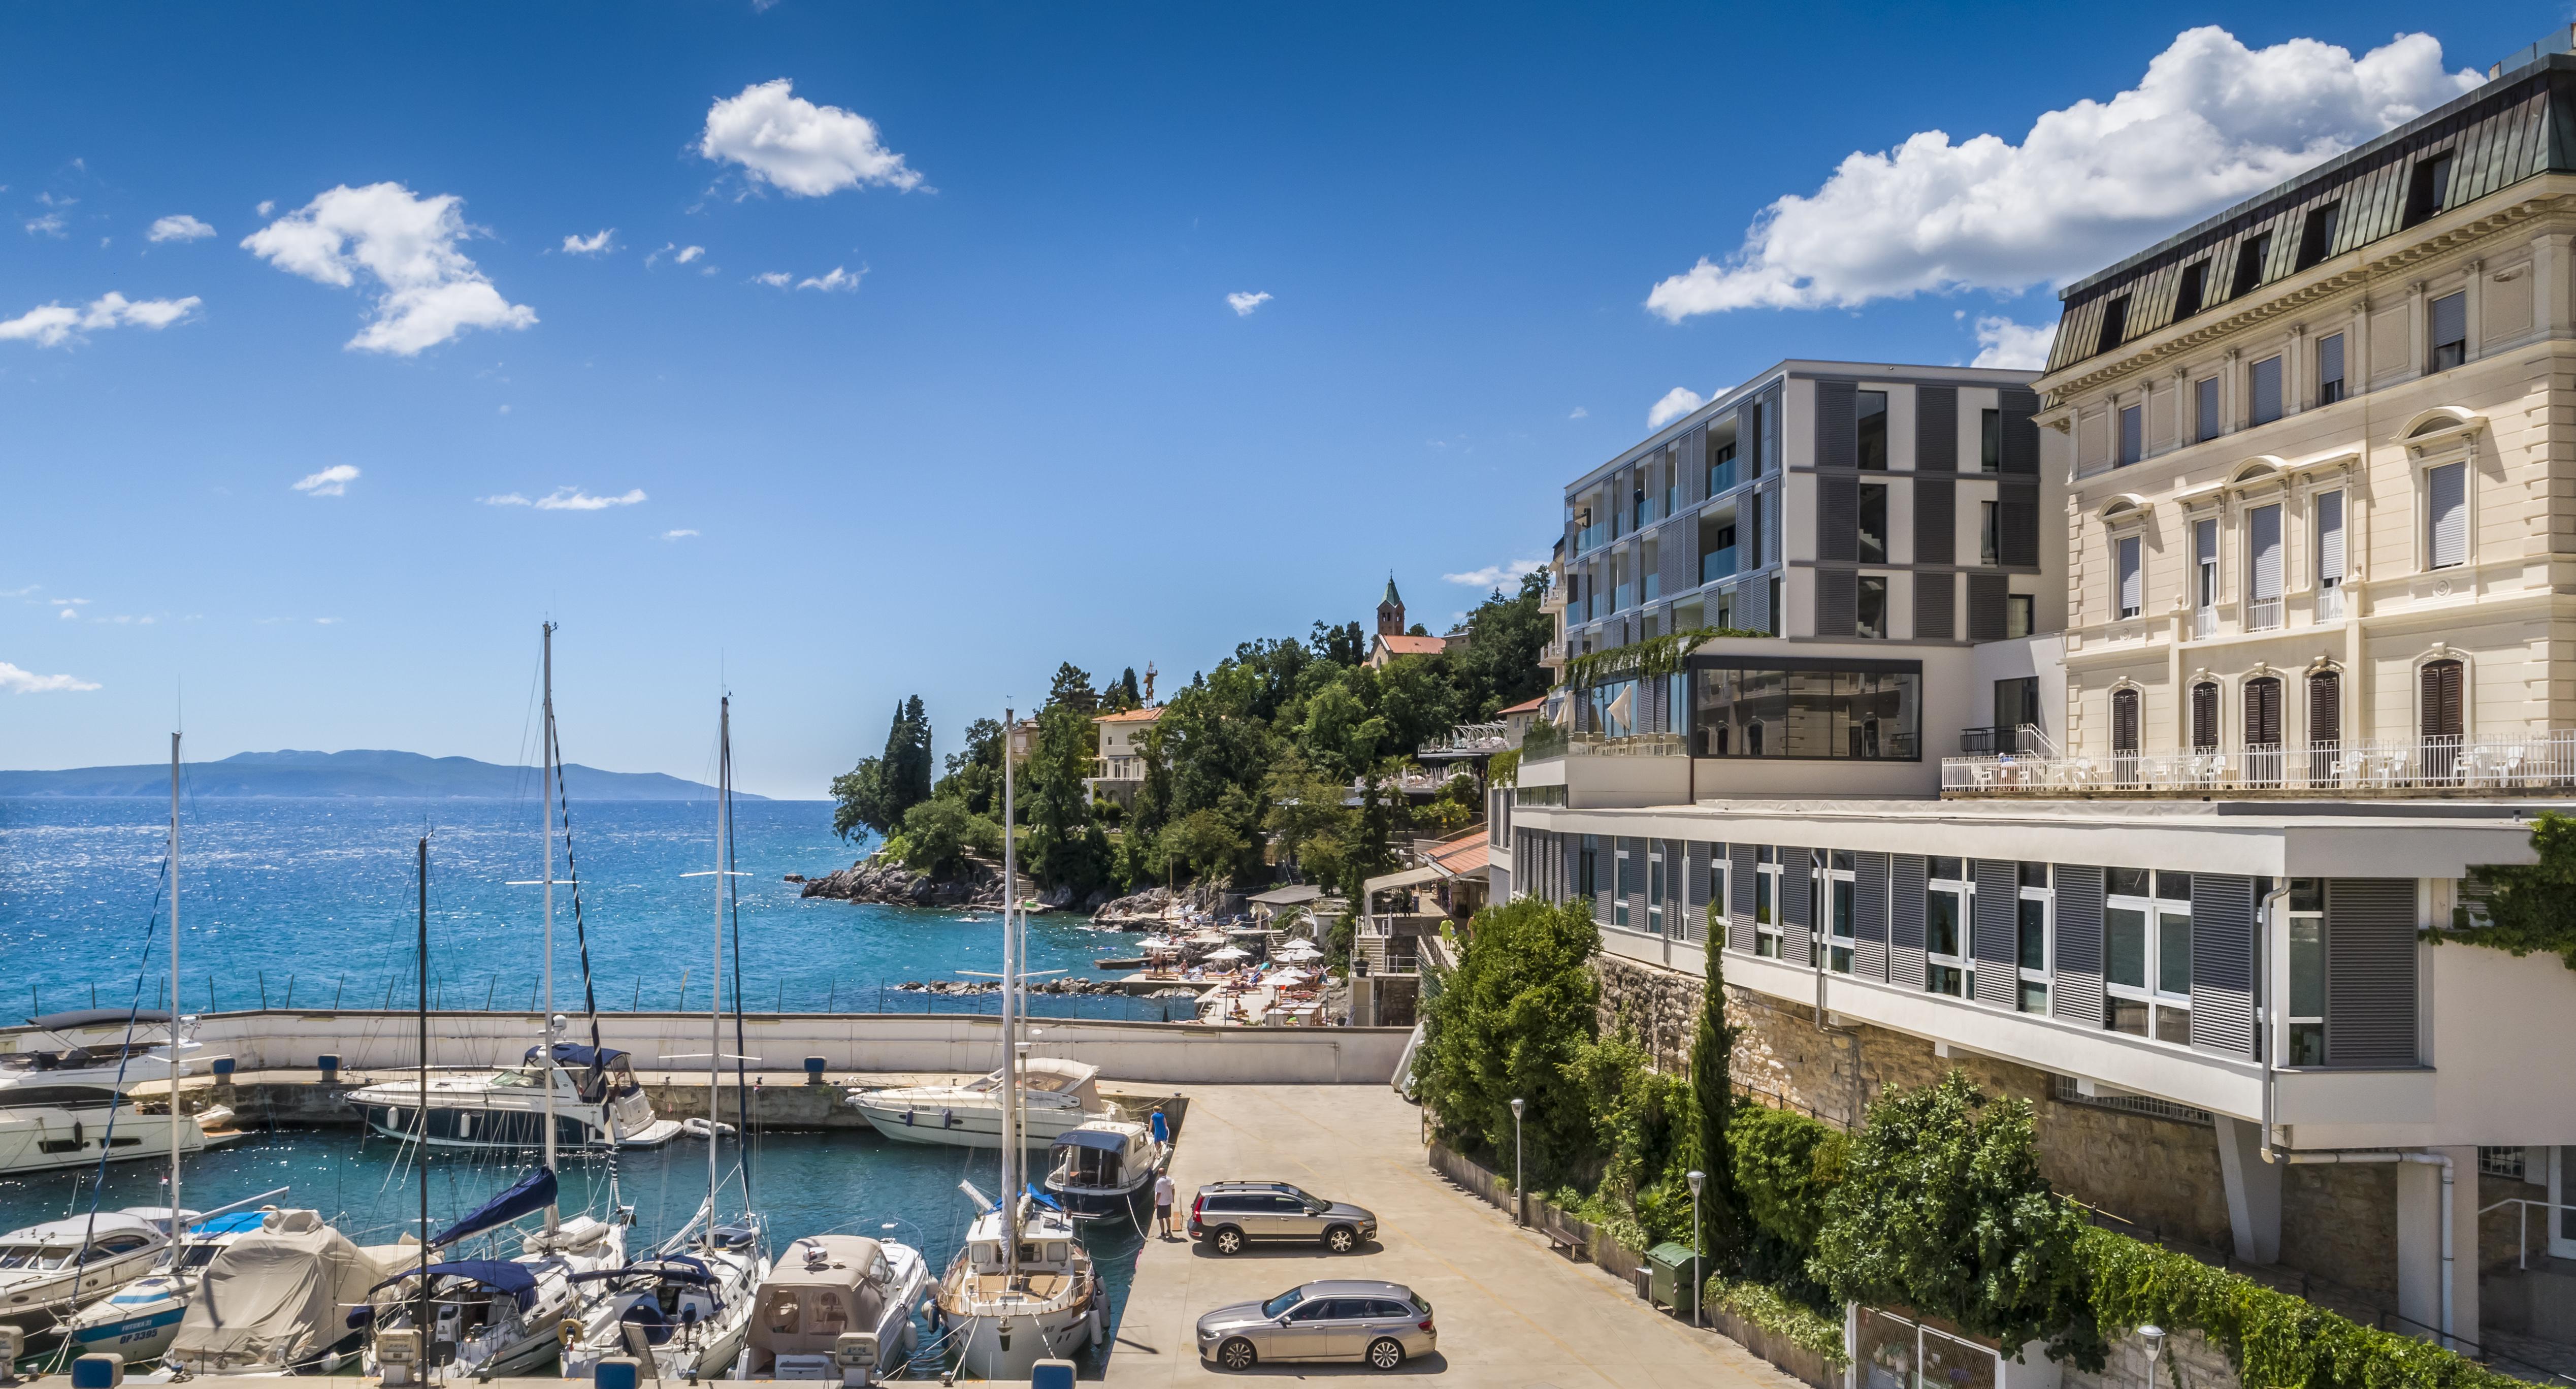 Hotel Istra Opatija Bewertung